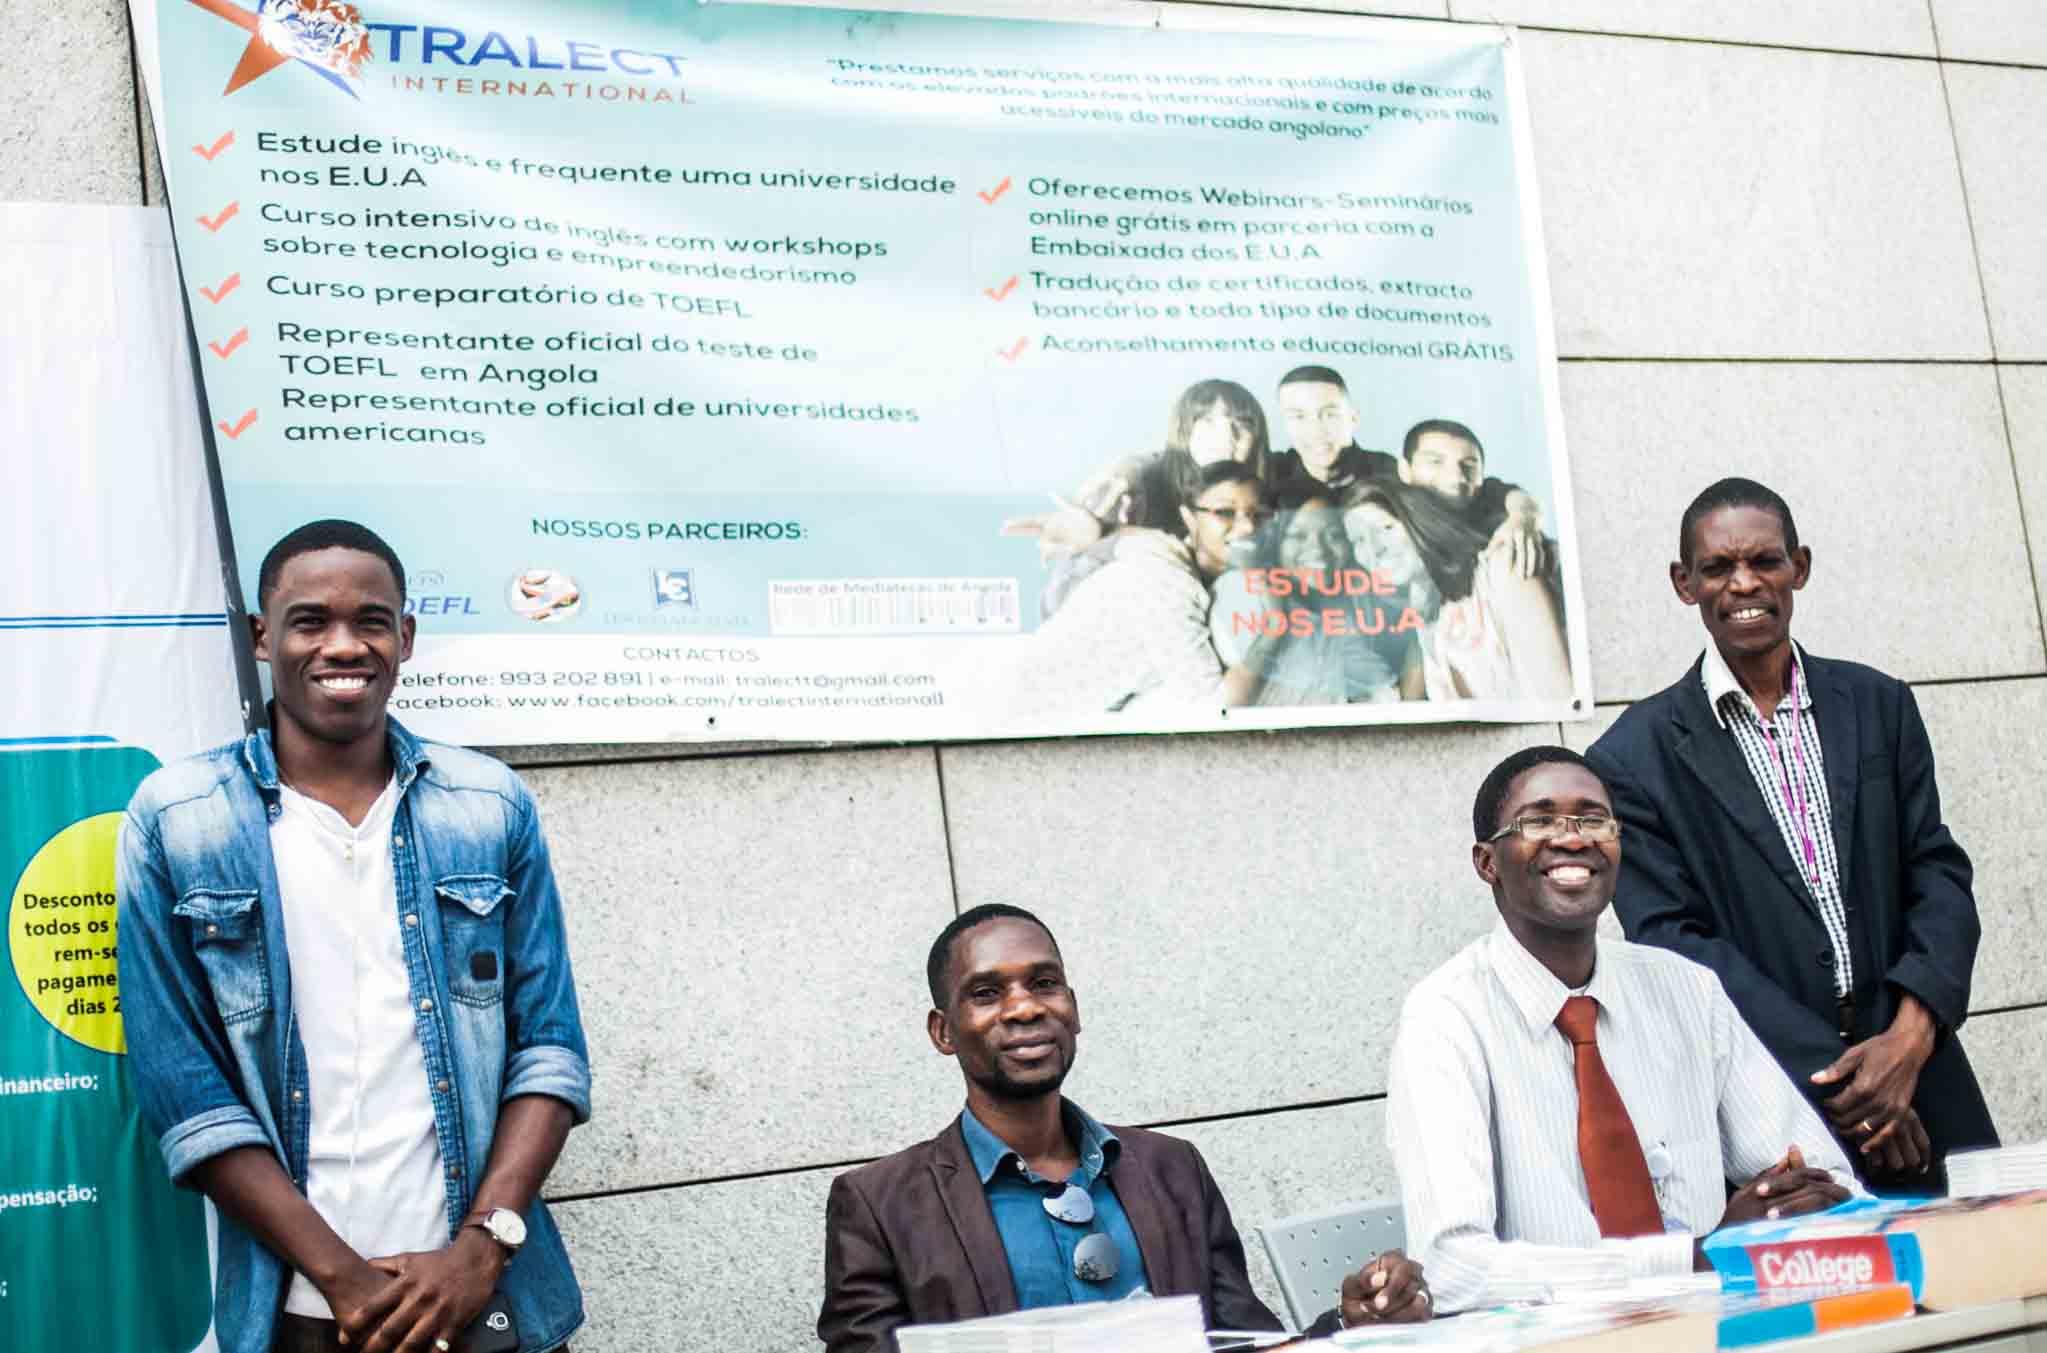 Tralect International: Rigor e qualidade no ensino da língua inglesa